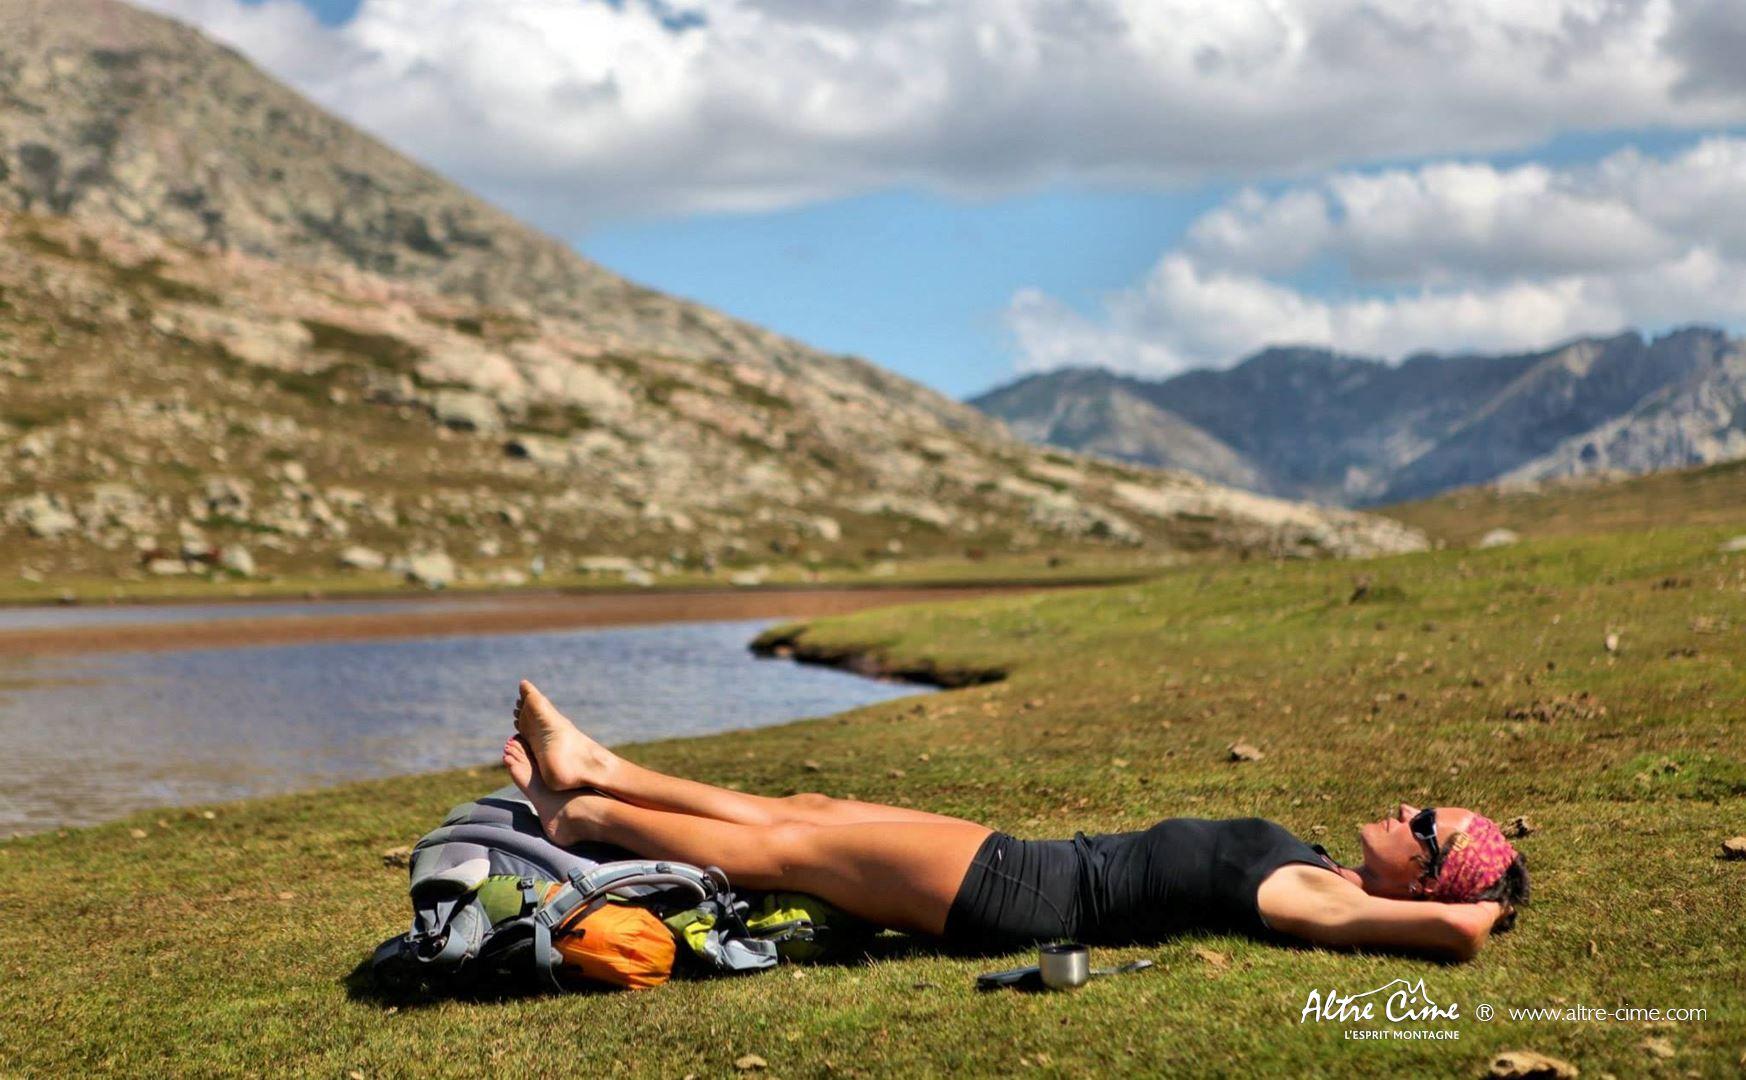 [Randonnée Corse Sauvage] Sieste au soleil !